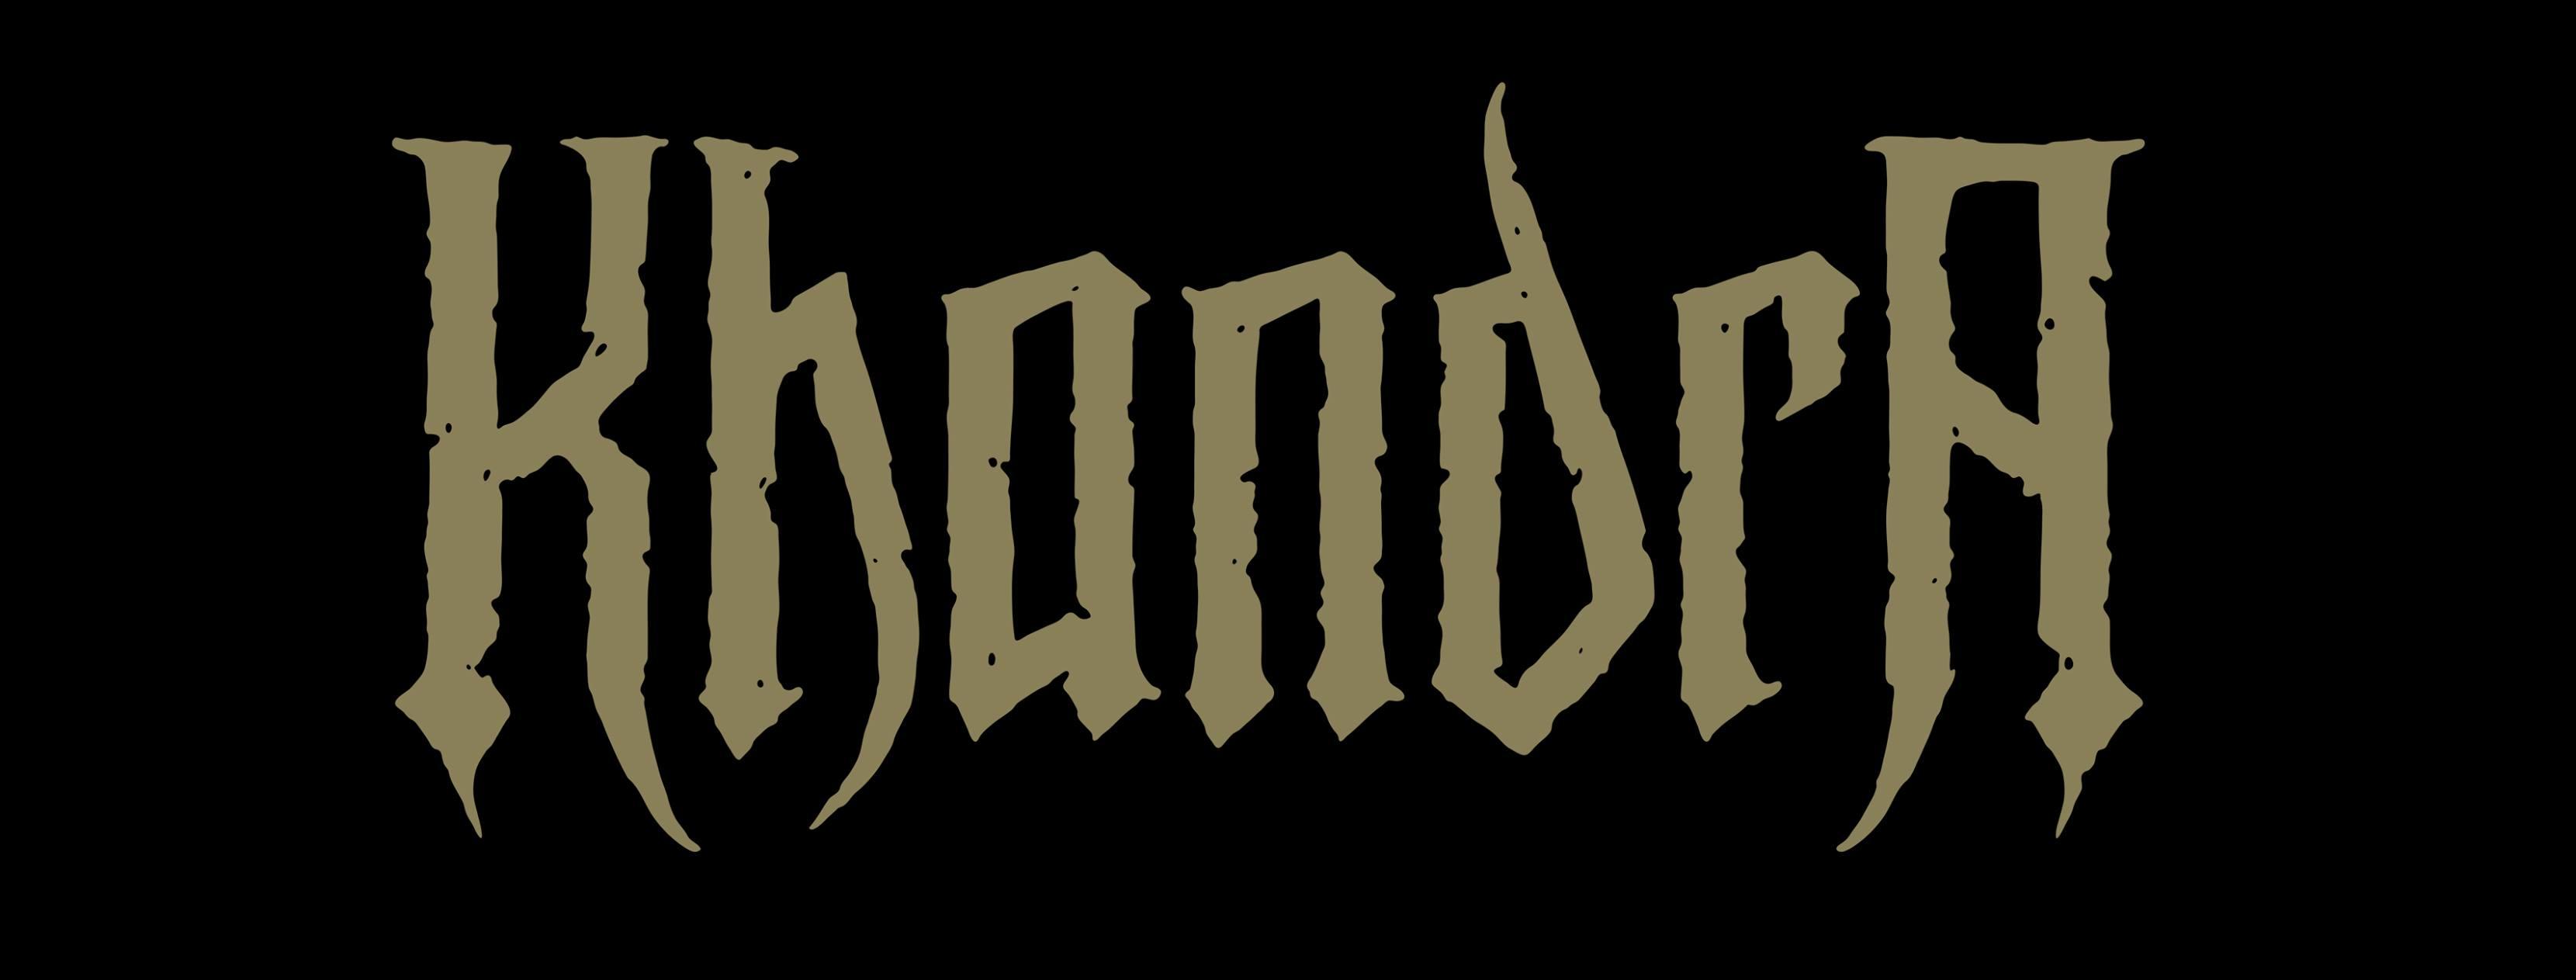 Khandra - Logo